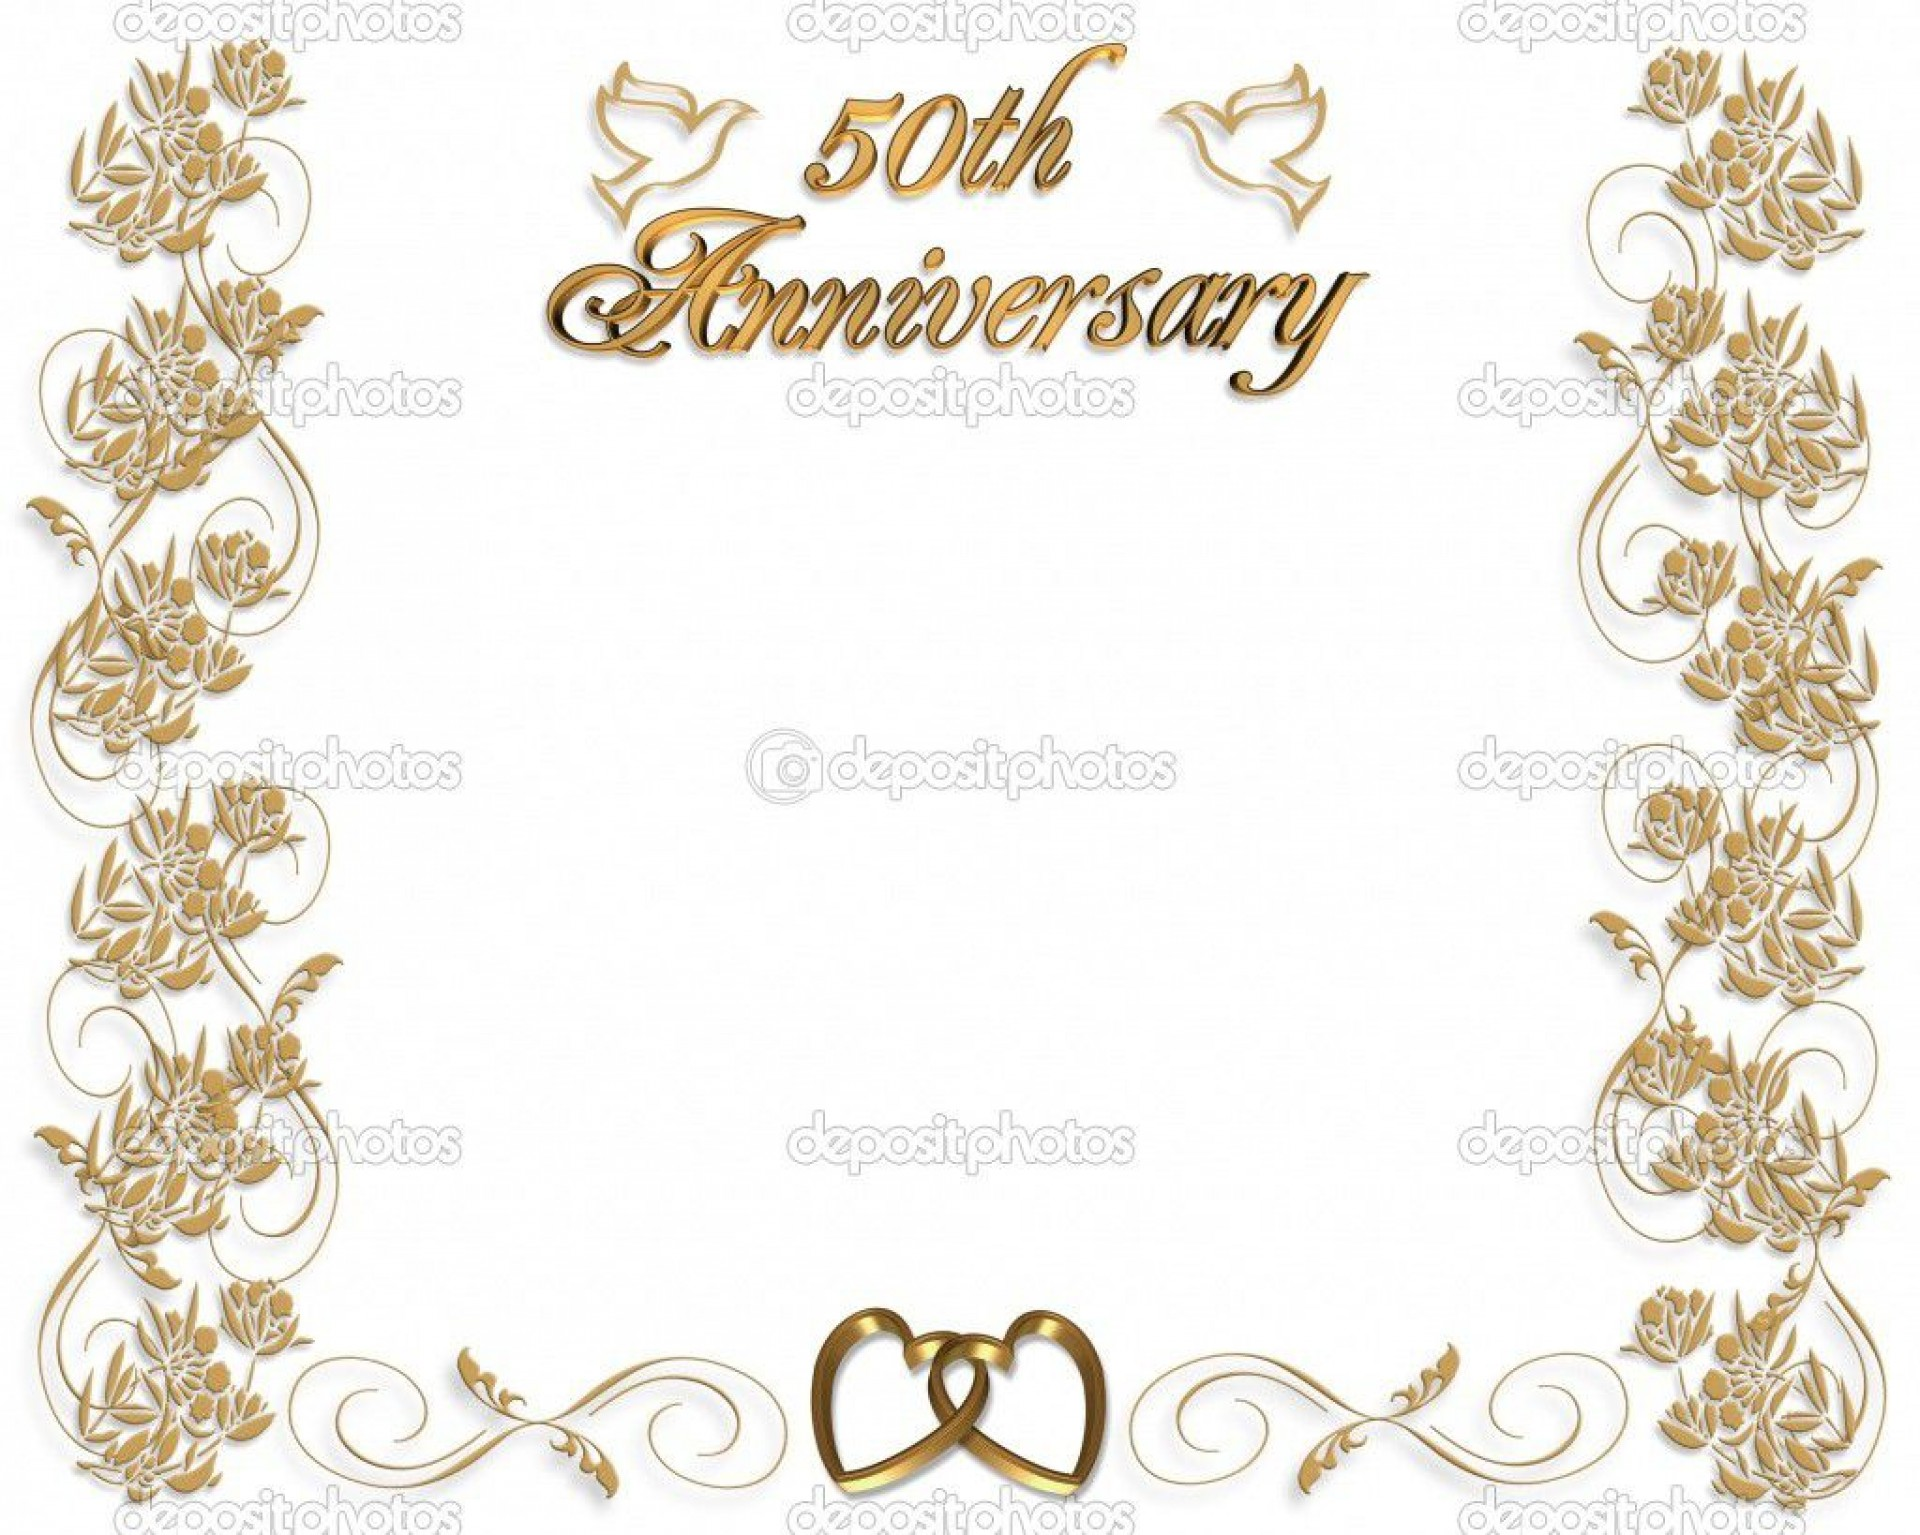 003 Marvelou 50th Wedding Anniversary Invitation Template Free Idea  Download Golden Microsoft Word1920